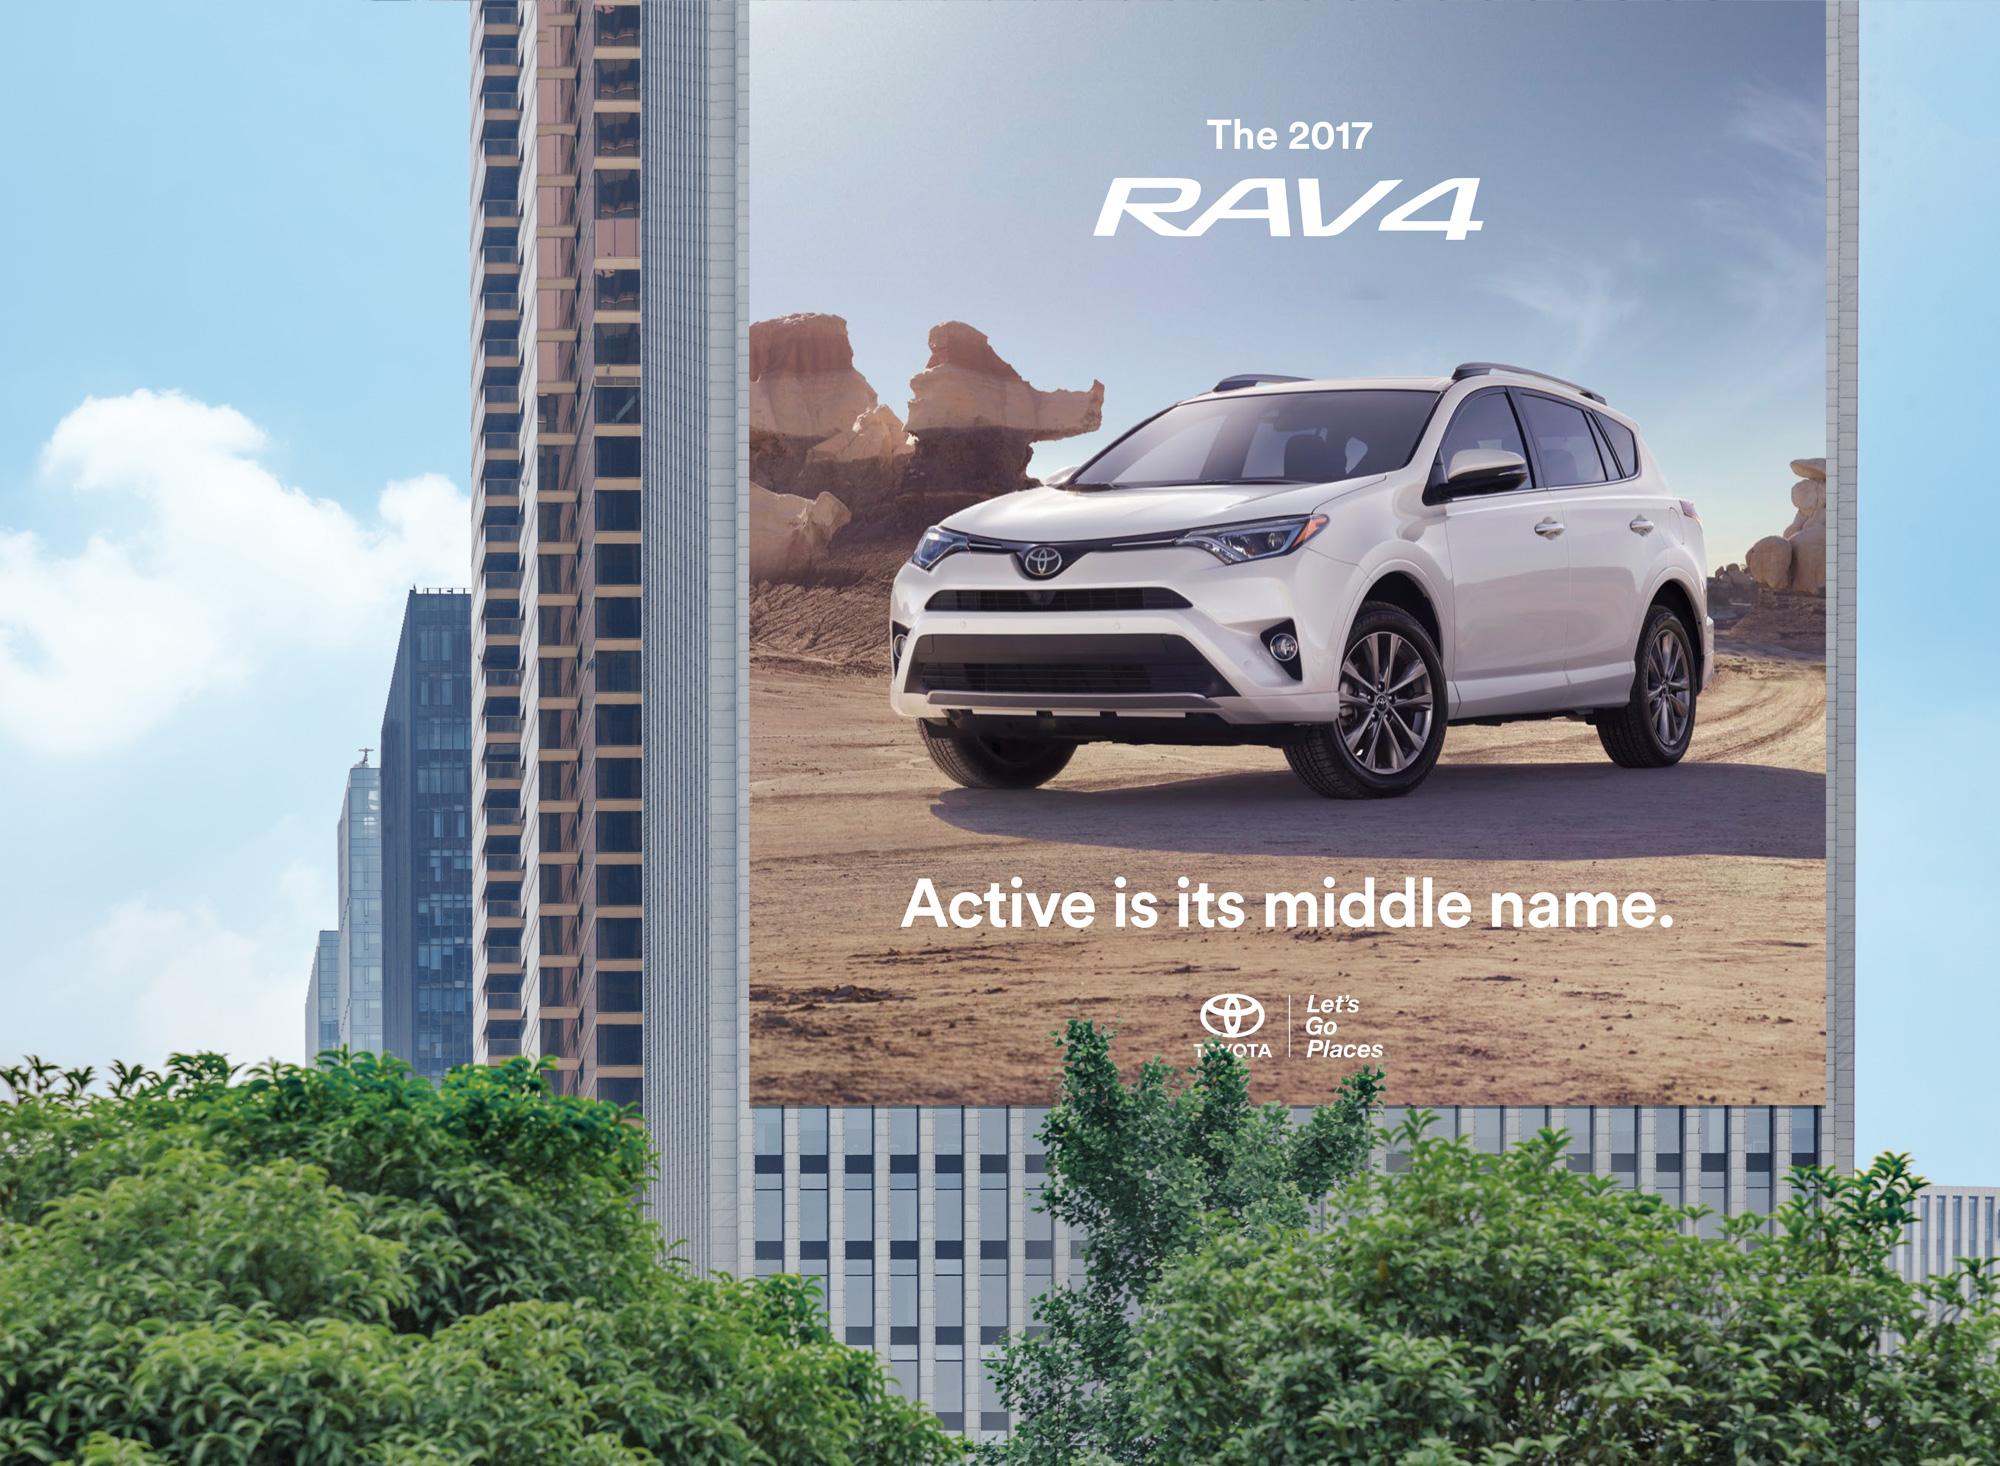 Toyota_RAV4_Detroit-billboard-with-trees